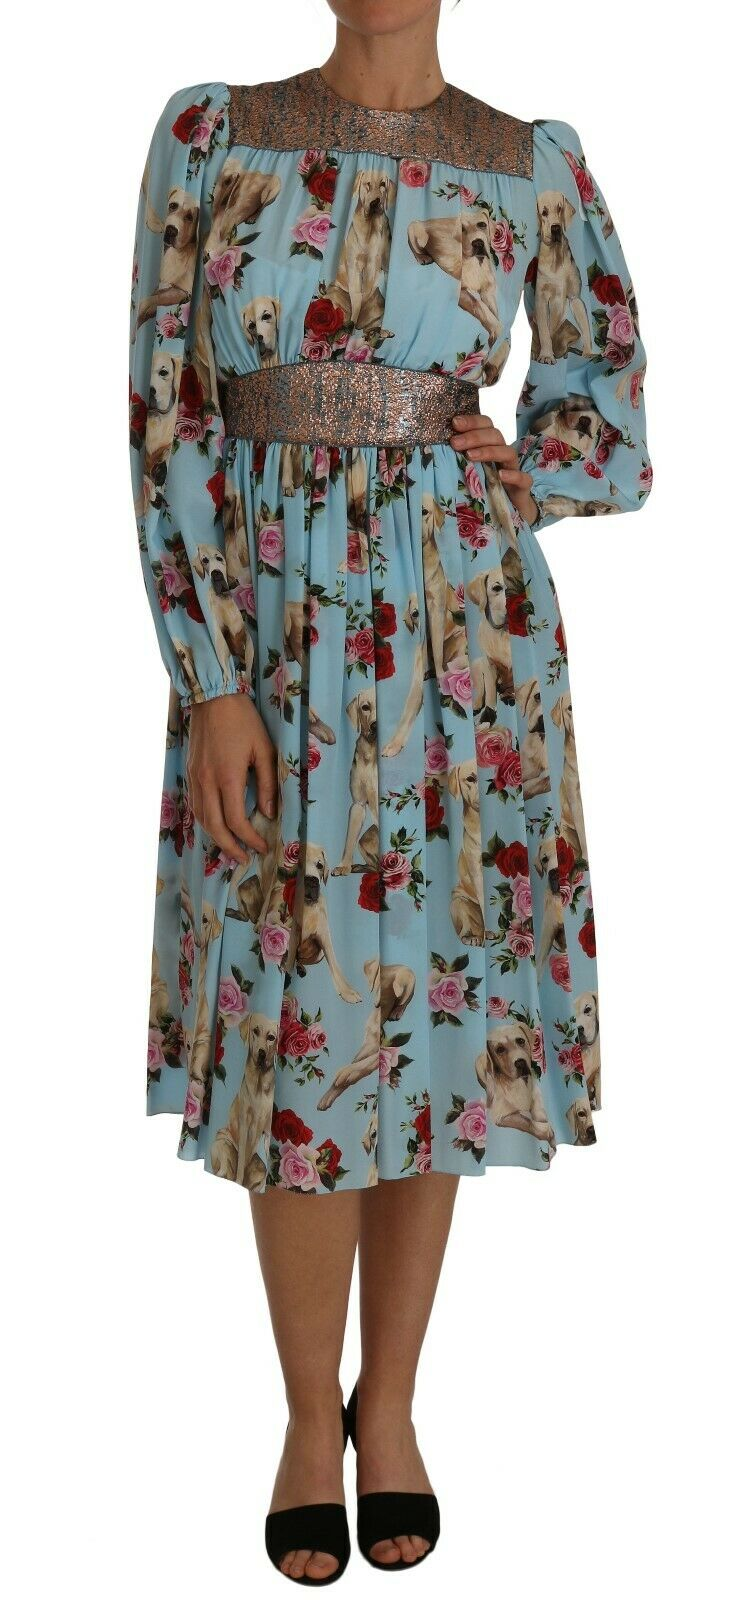 Dolce & Gabbana Women's Silk Labrador Dog Roses Print Dress Blue DR1433 - IT36 | XS